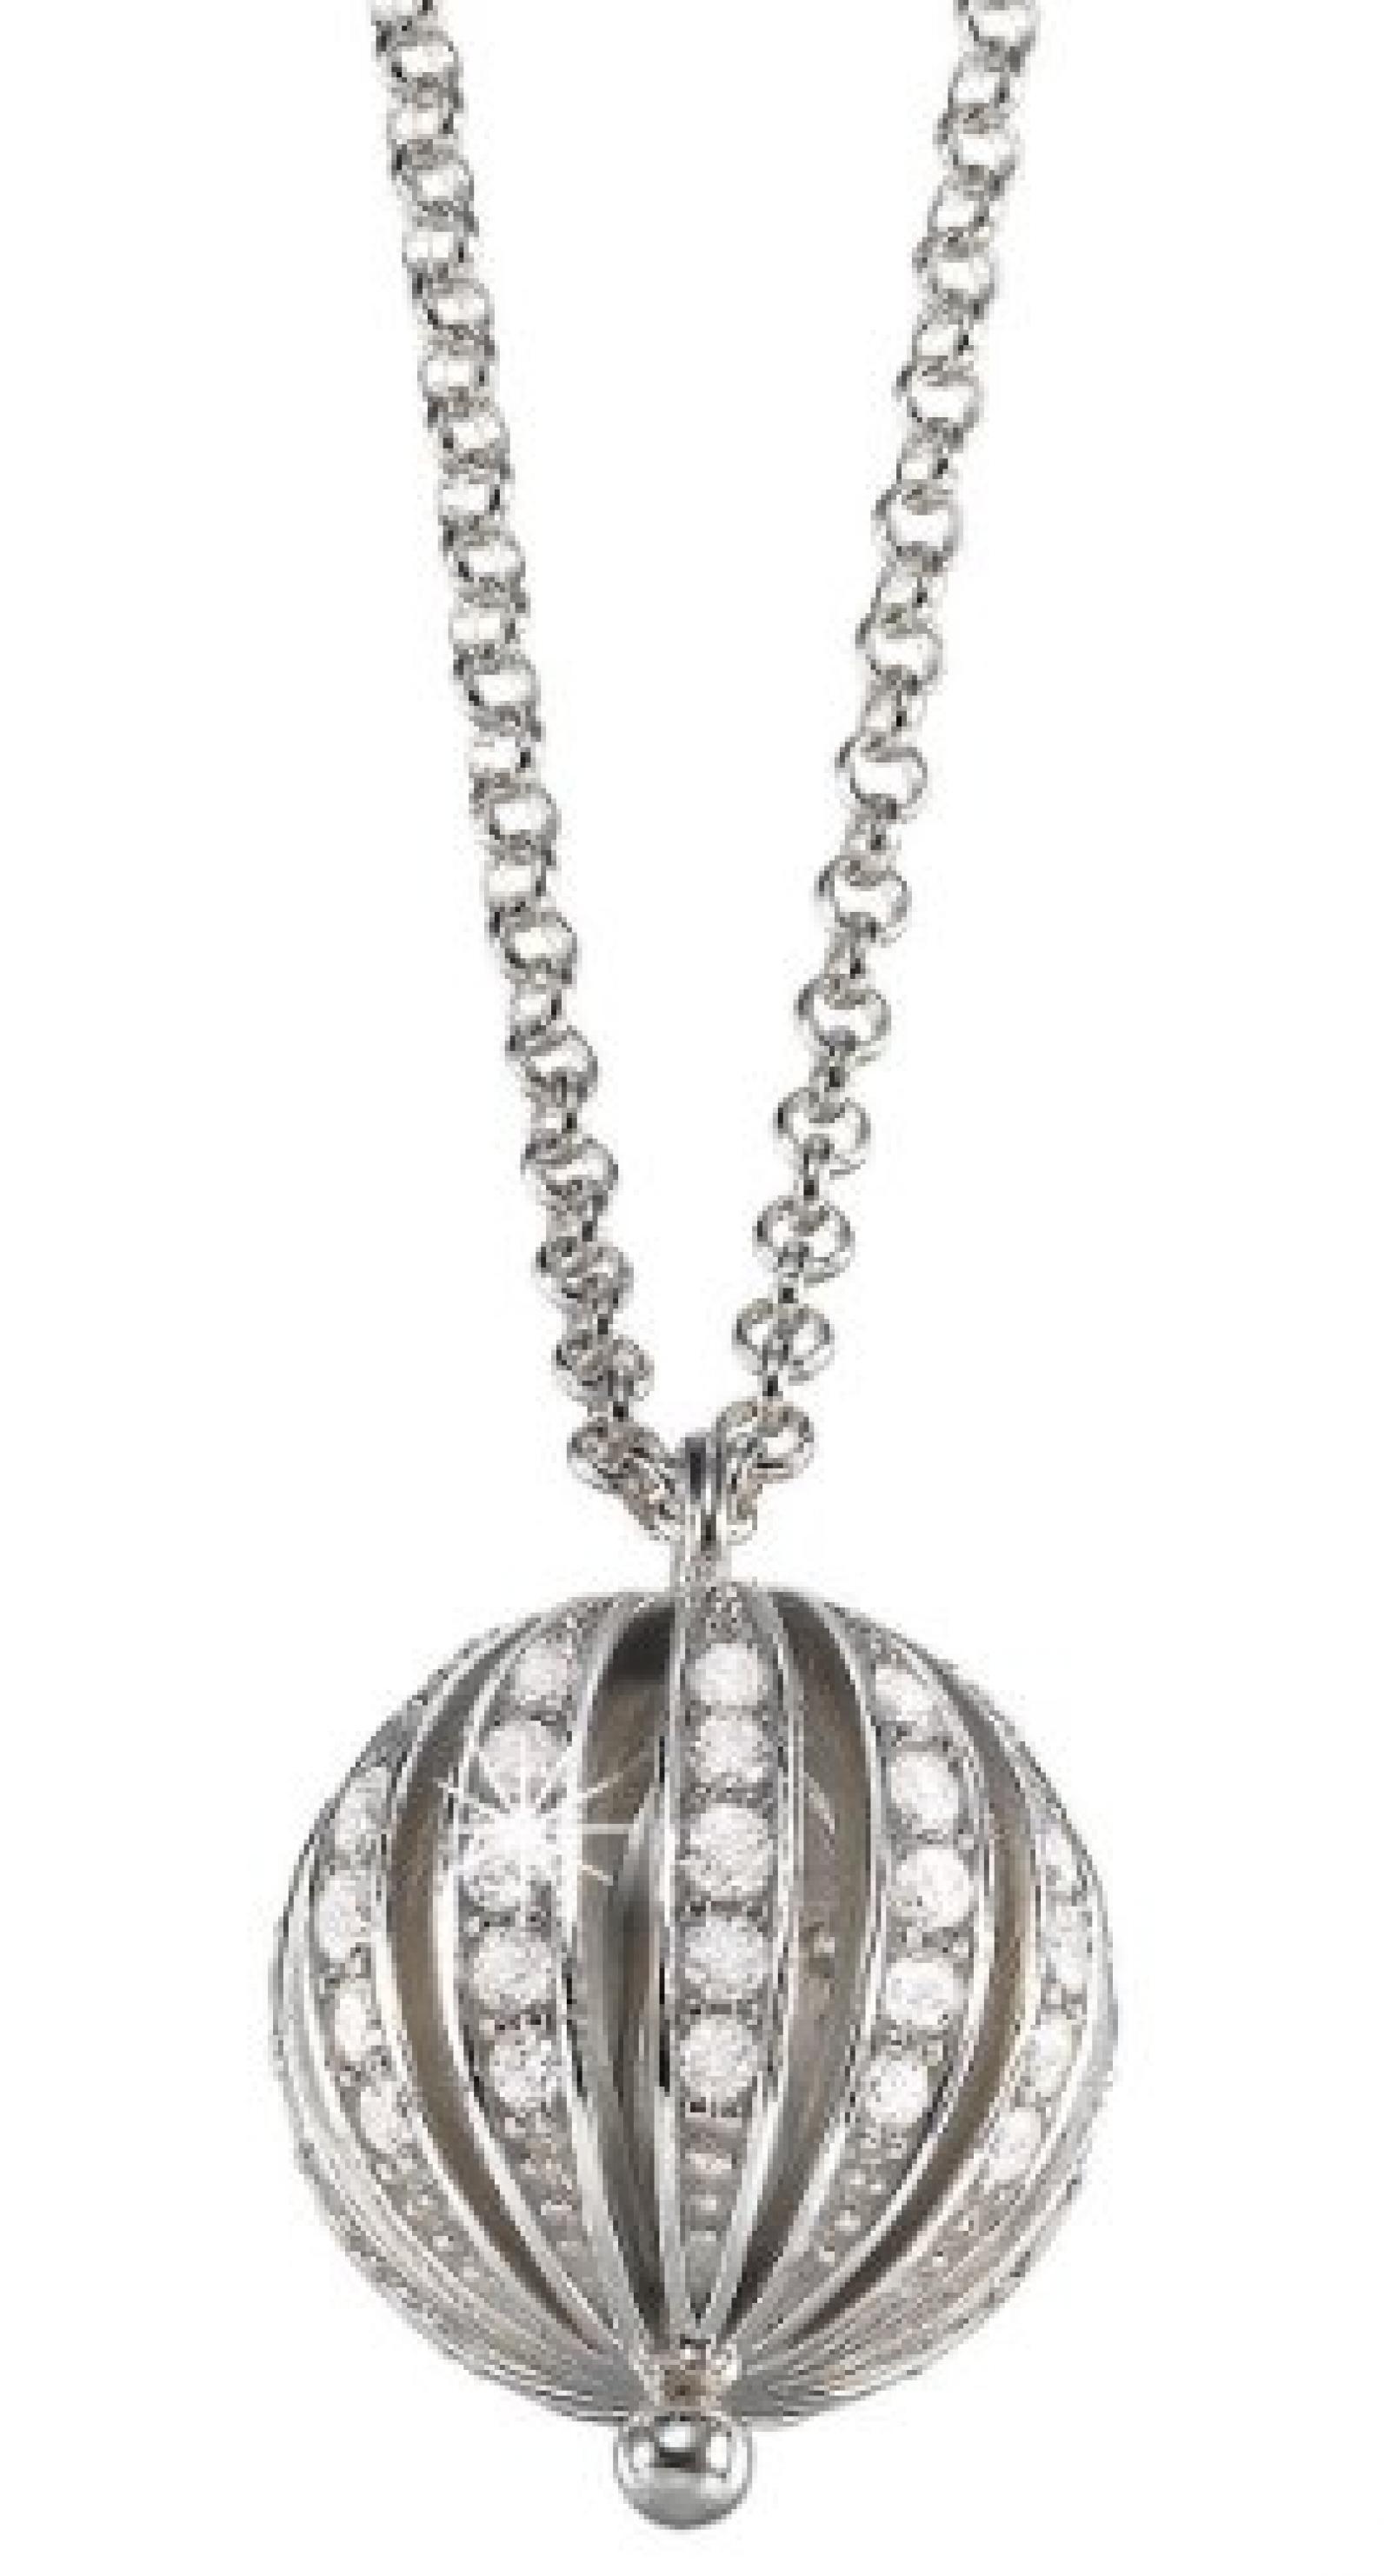 Pierre Cardin Damen Halskette 925 Sterling Silber rhodiniert Kristall Zirkonia Pure 75 cm weiß PCNL90384A750